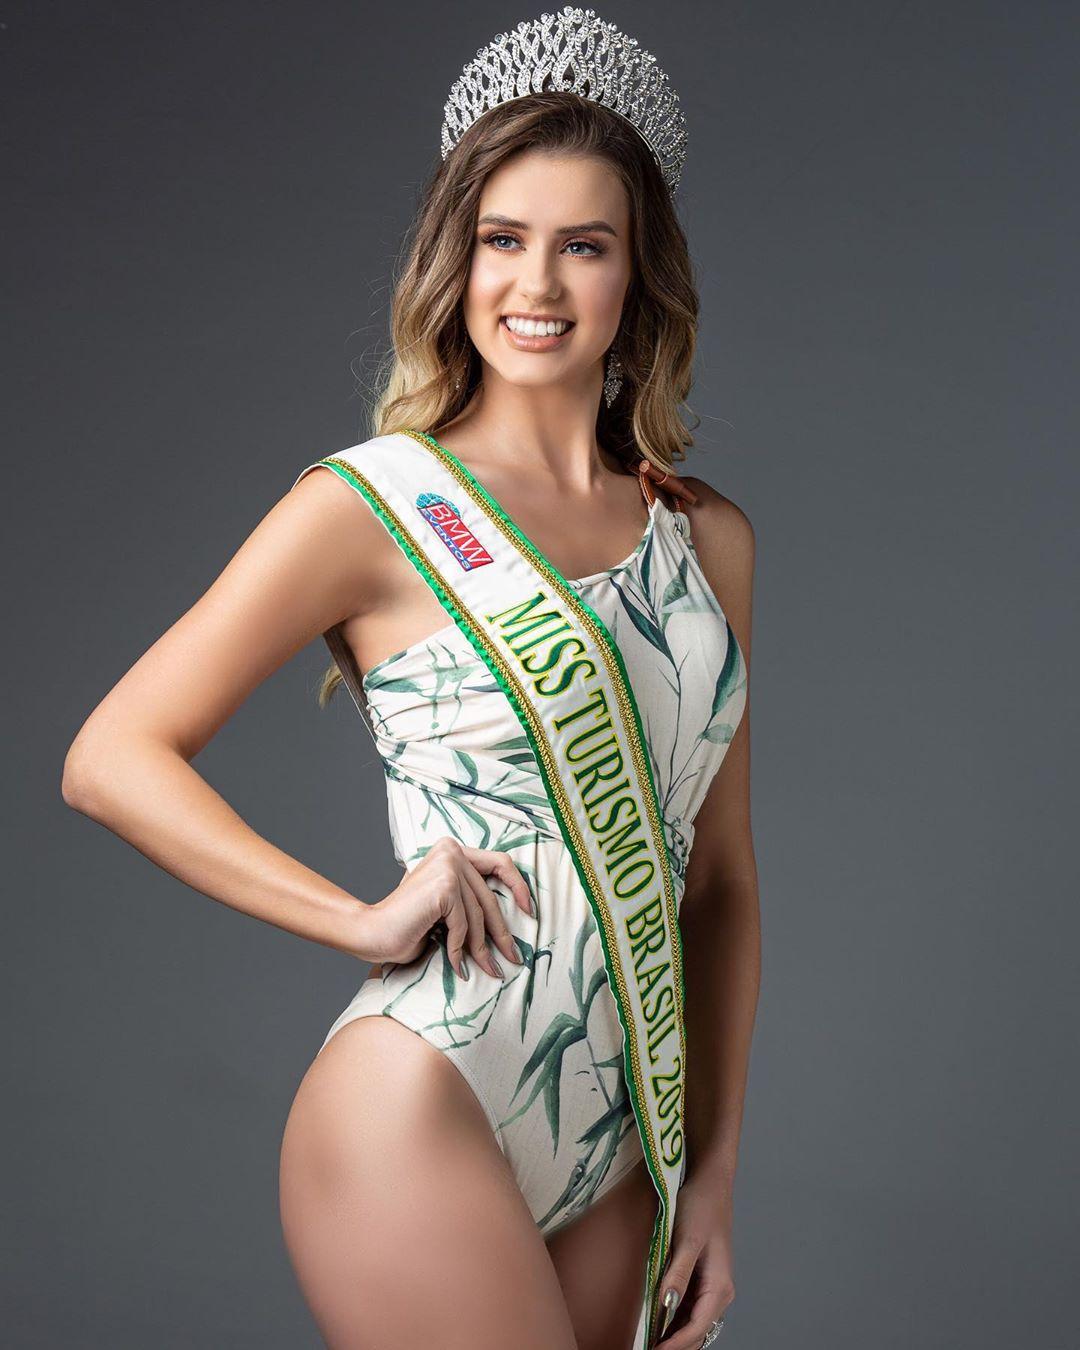 marcella kozinski de barros, 3rd runner-up de miss tourism world 2019. 69232310